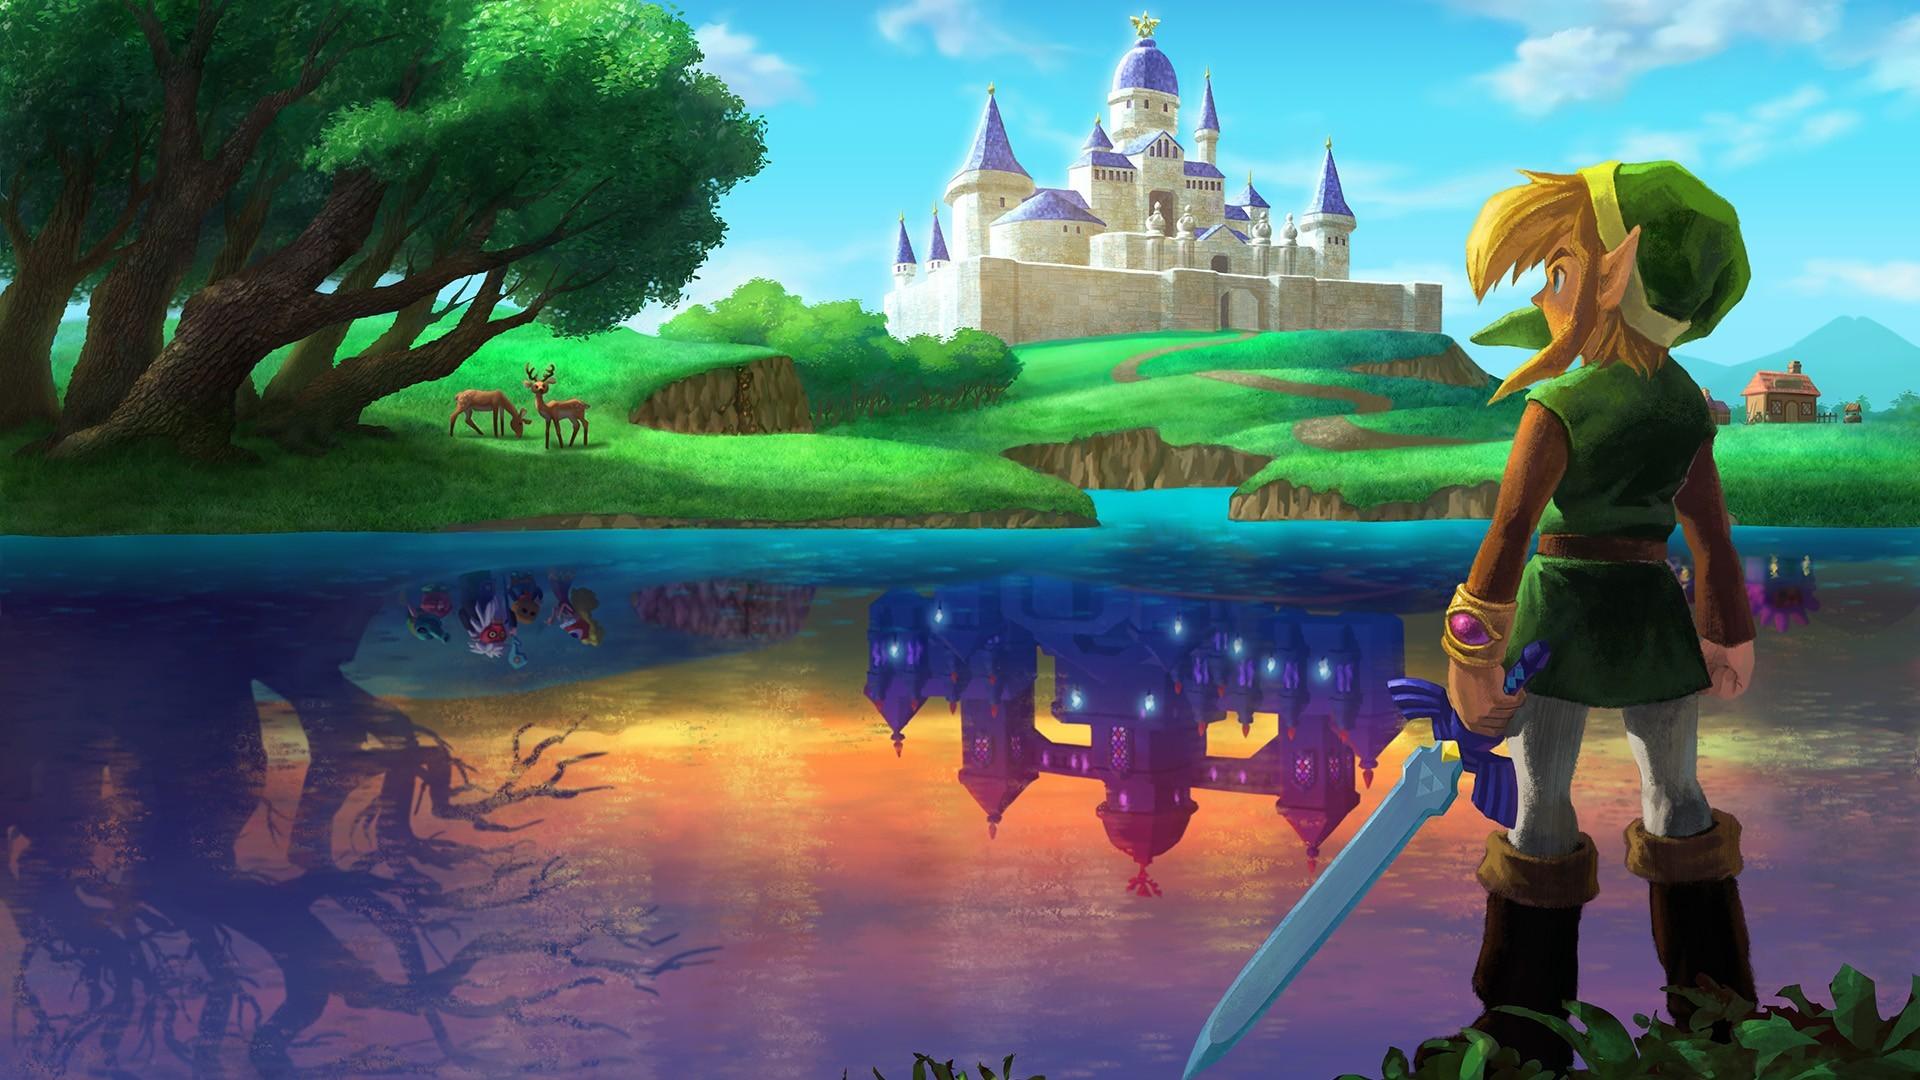 Res: 1920x1080, The Legend Of Zelda Video Game